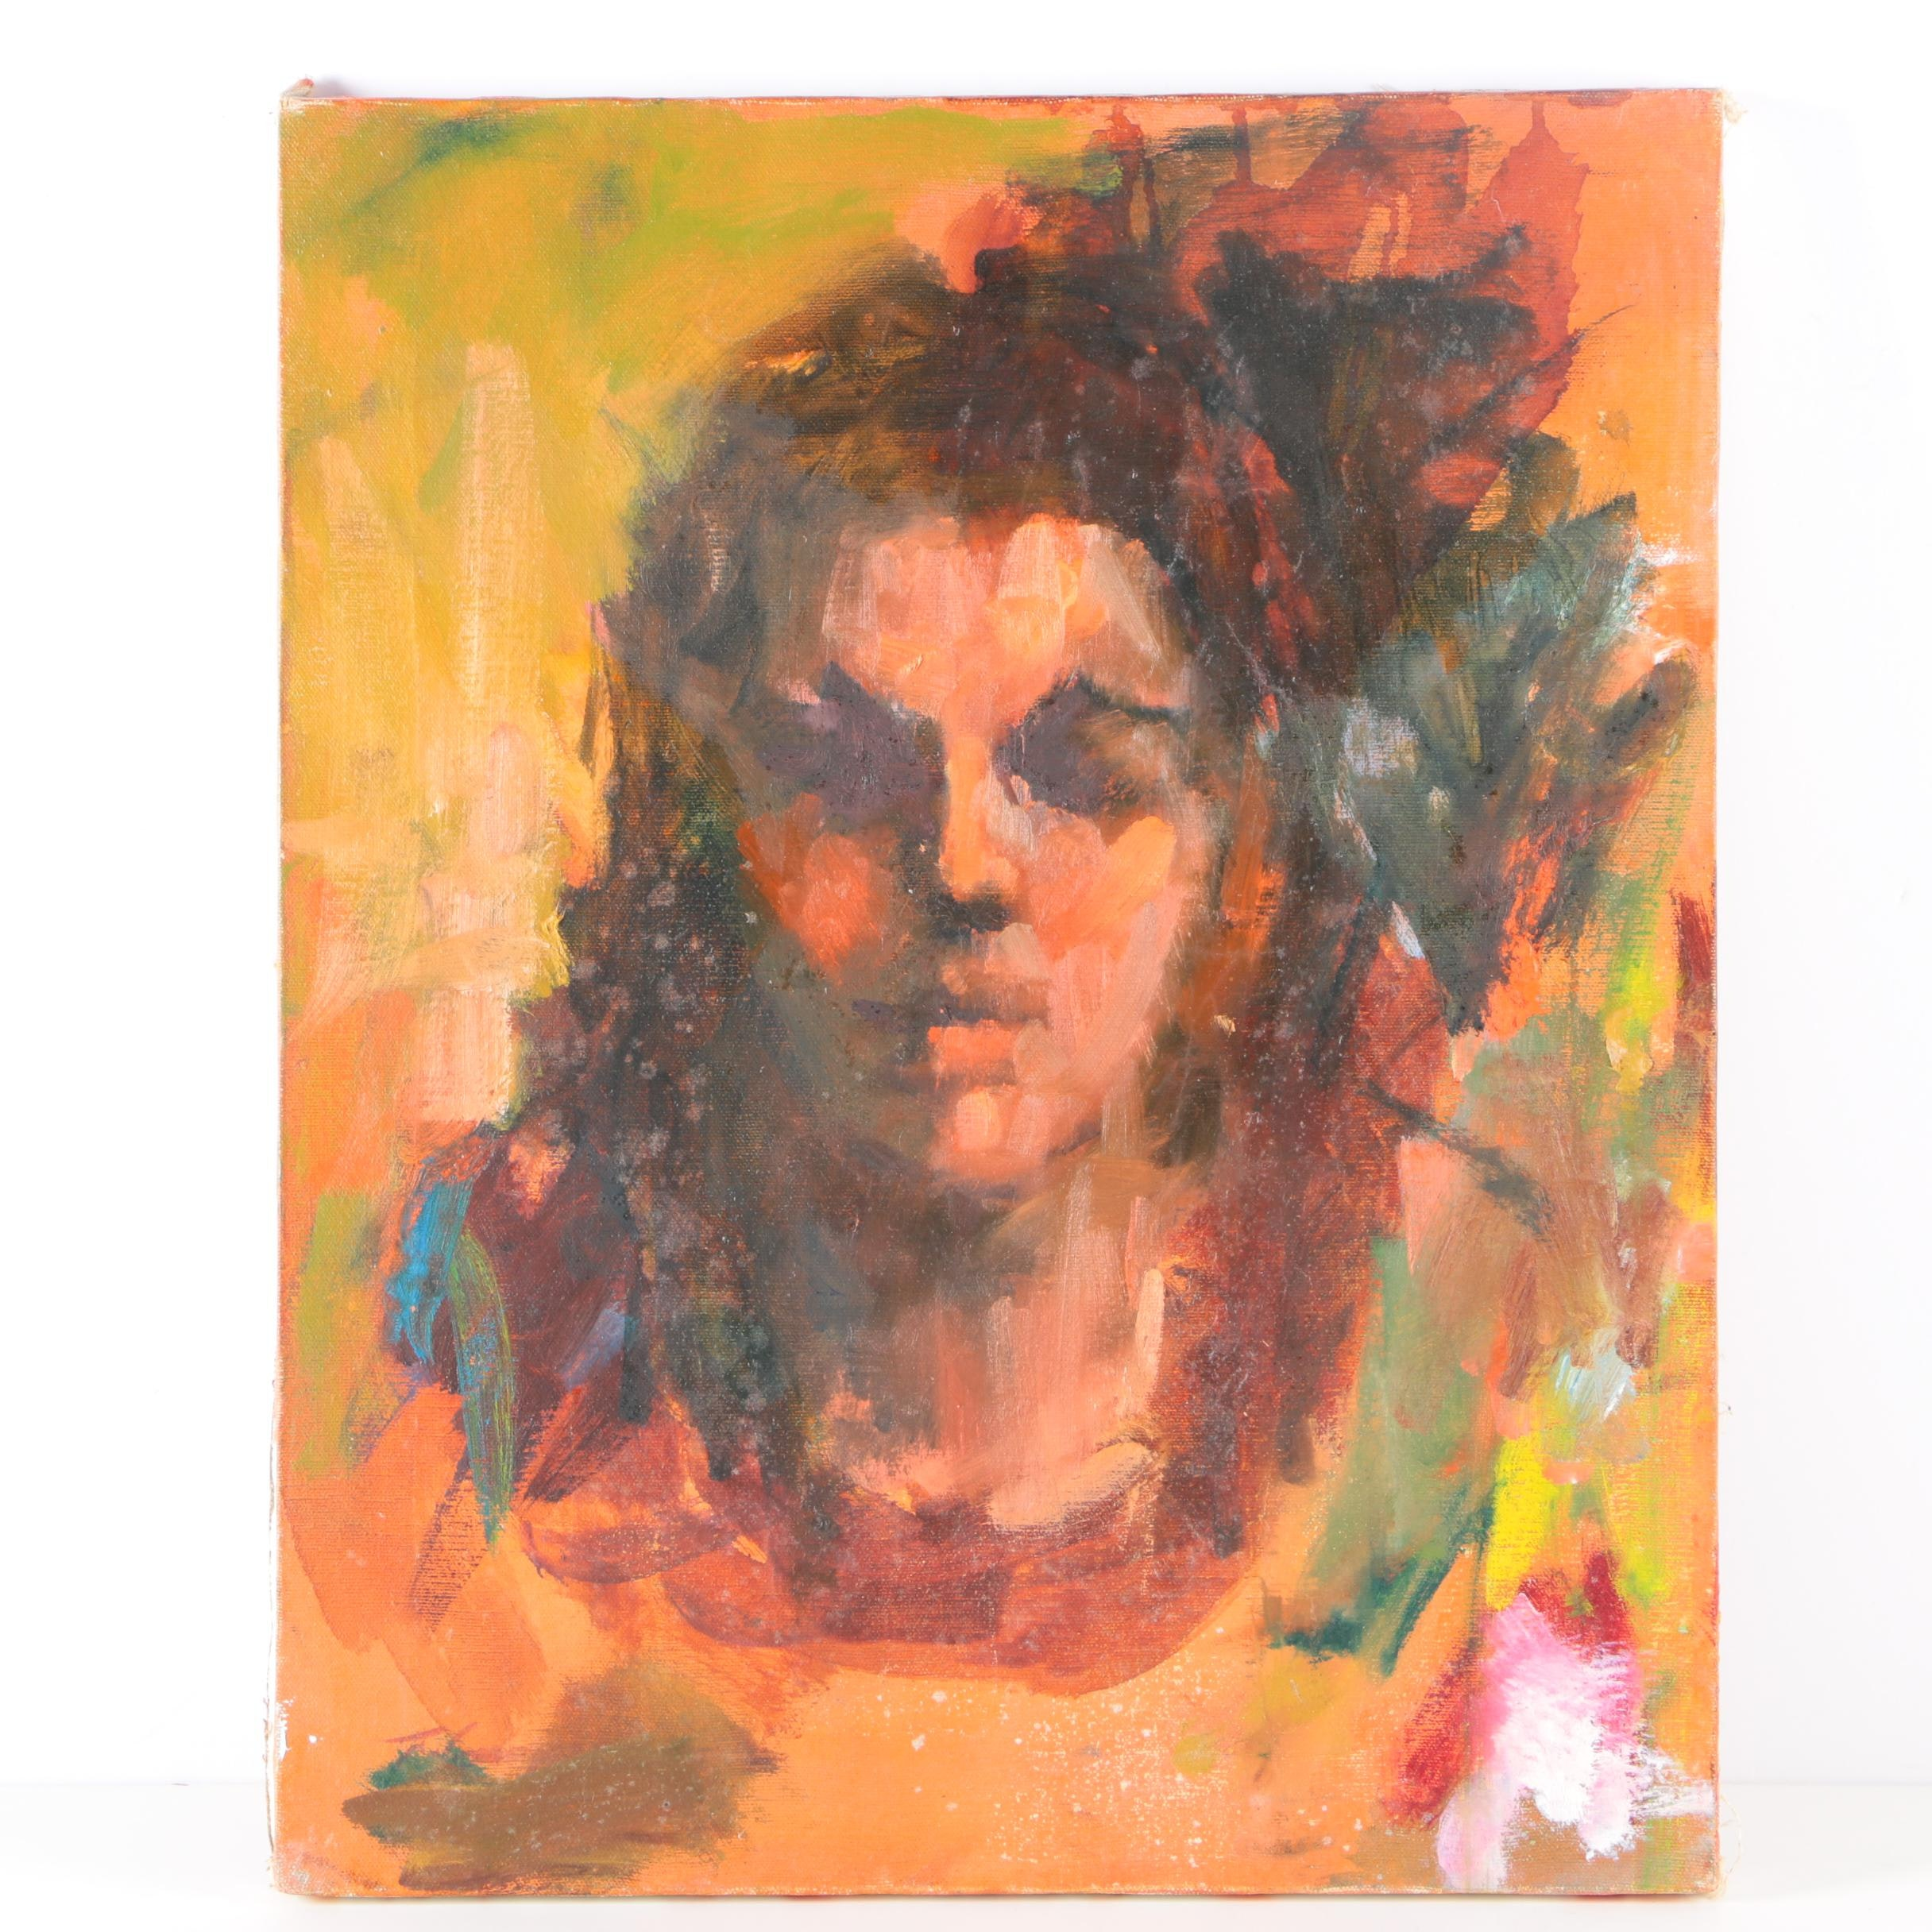 Oil Portrait Painting on Canvas